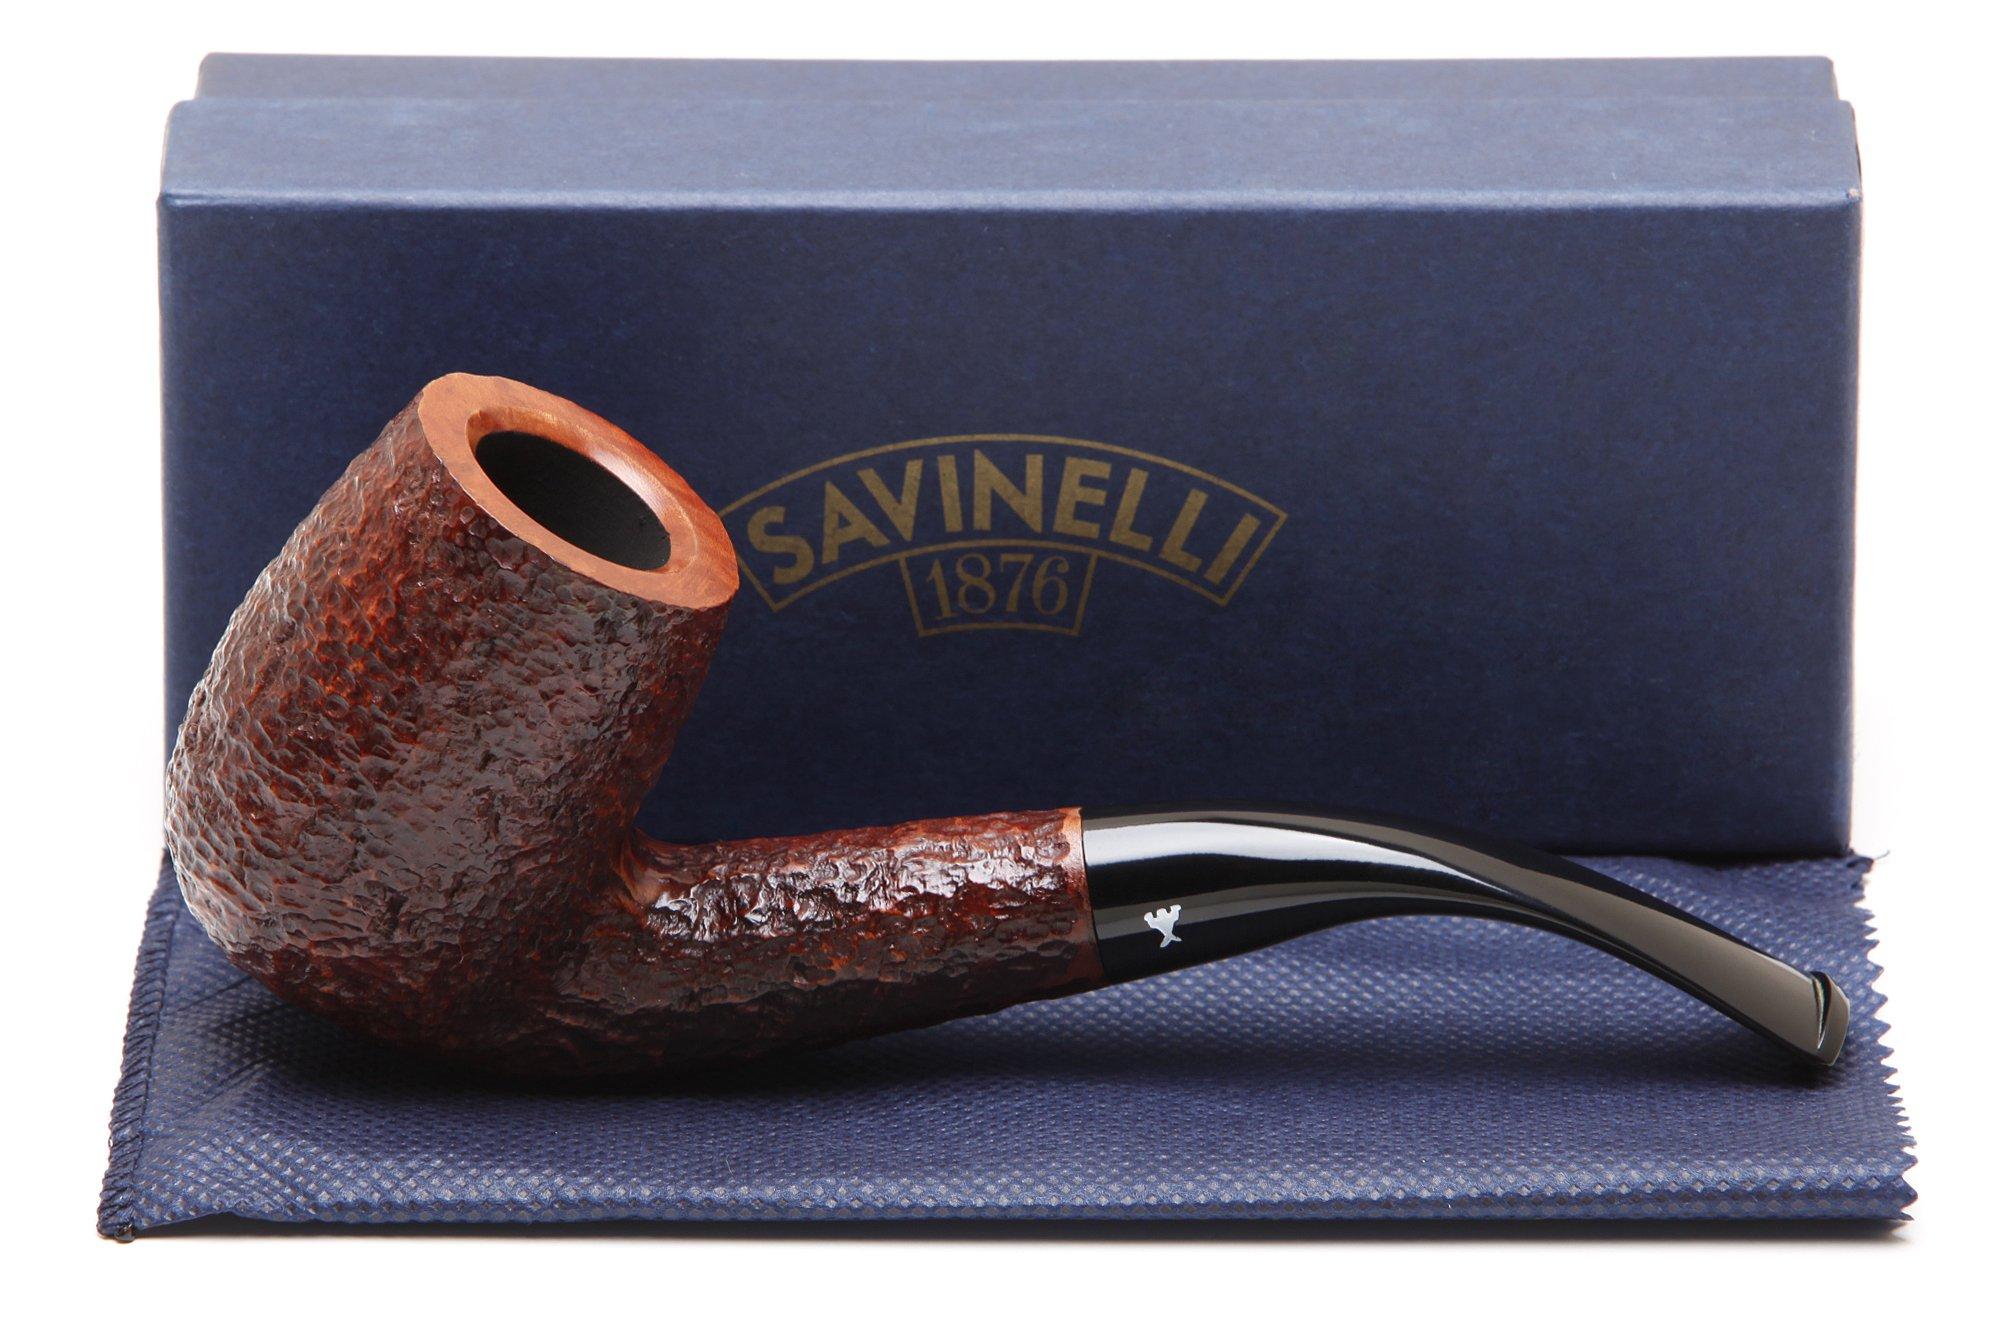 Savinelli Hercules Brownblast EX 606 Tobacco Pipe by Savinelli